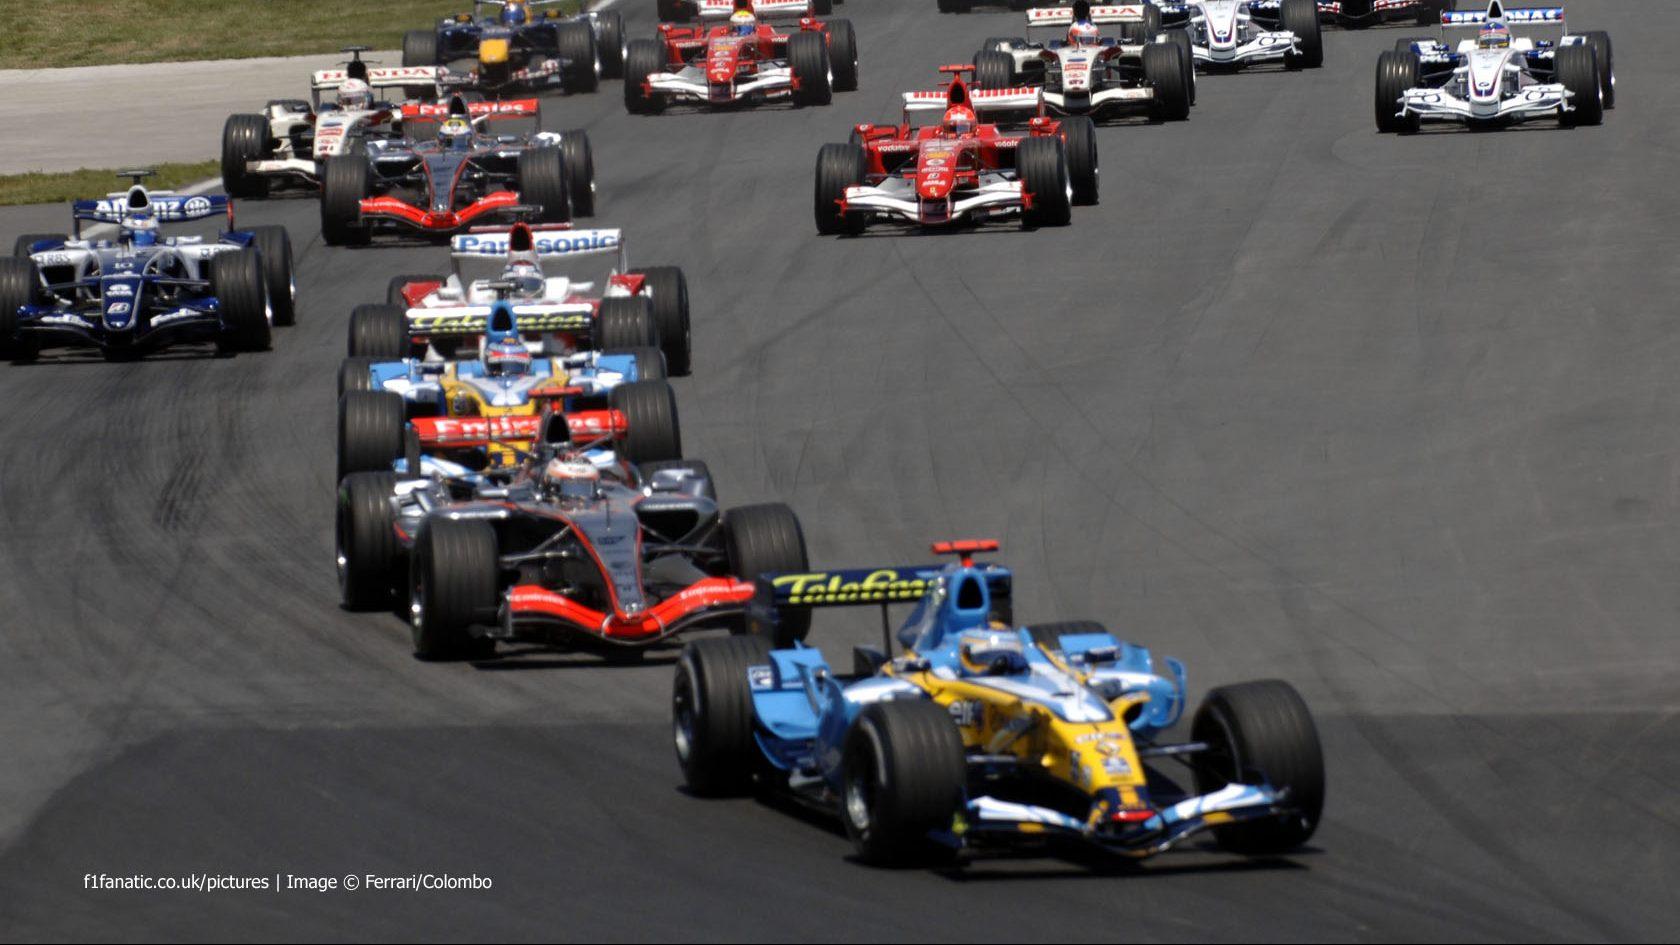 Start, Canadian Grand Prix, Circuit Gilles Villeneuve, Montreal, 2006